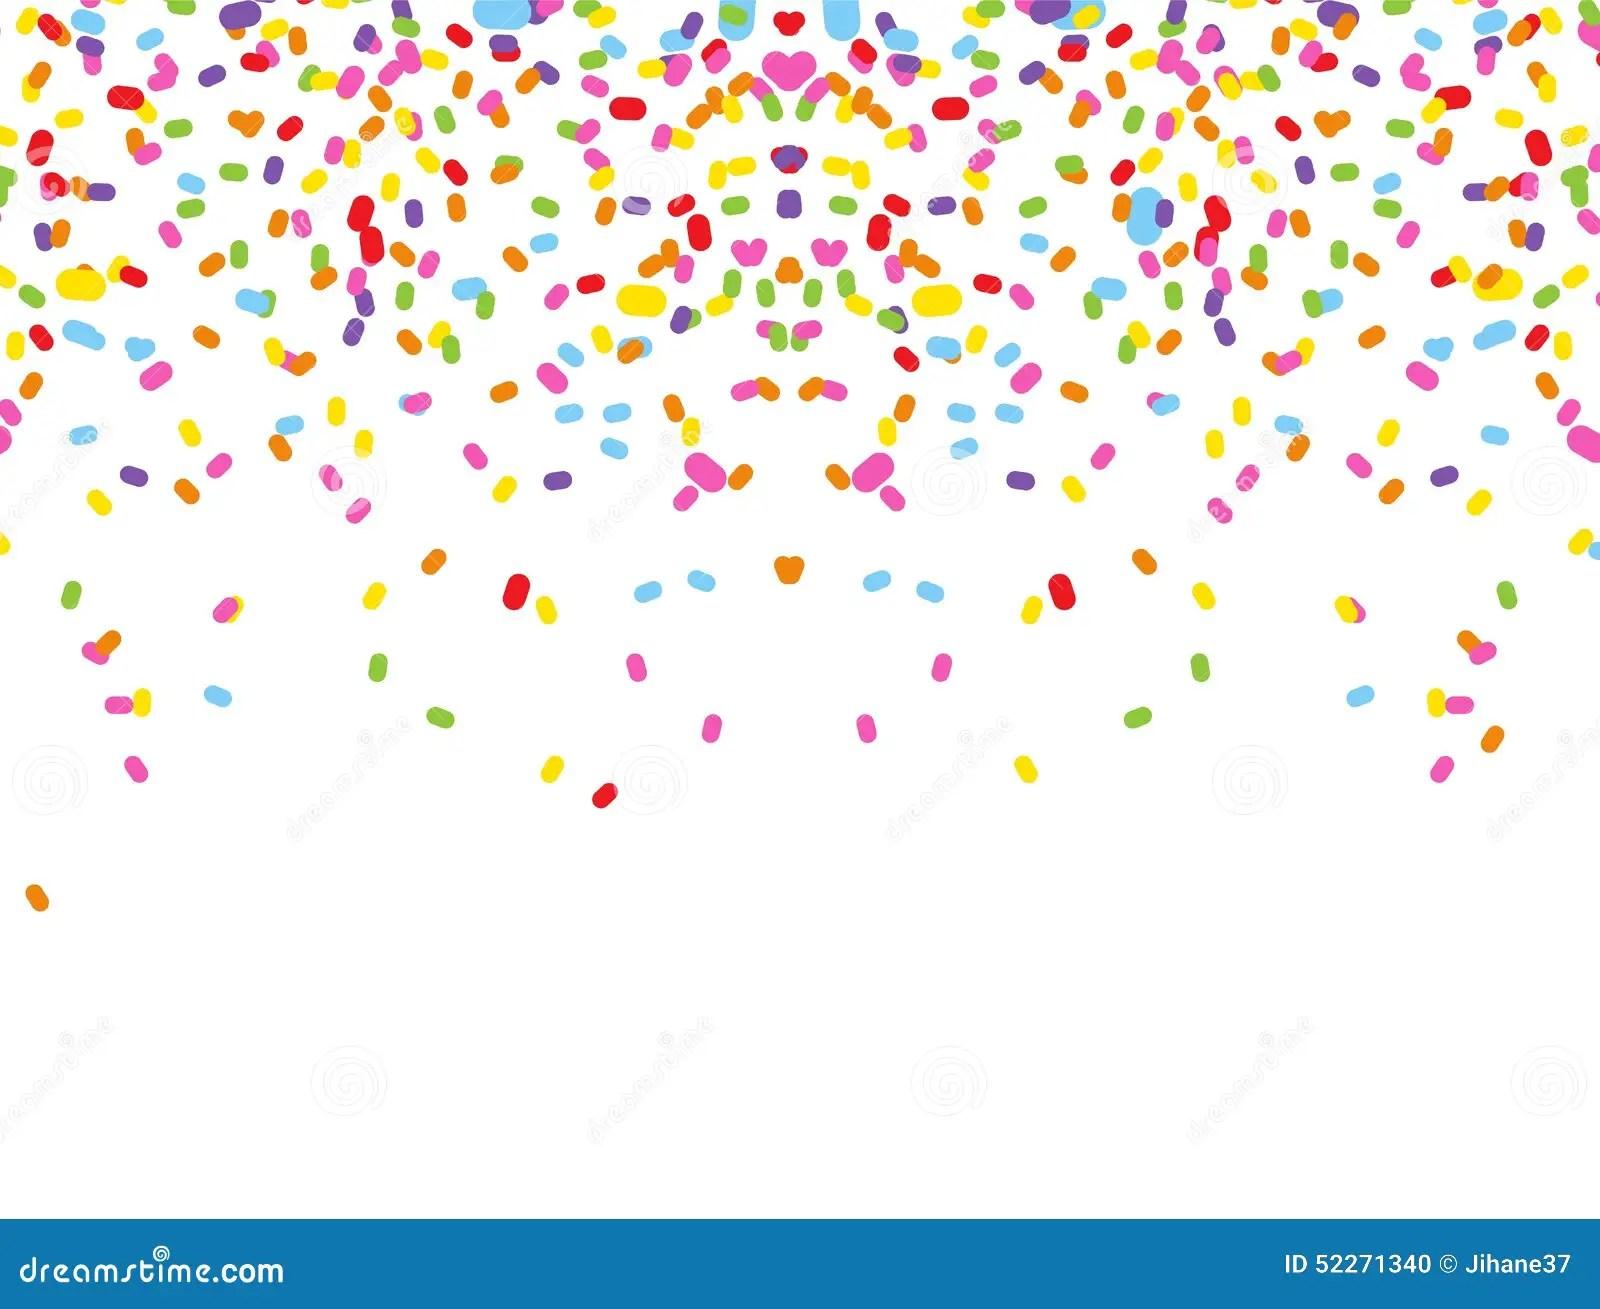 Falling Stars Gif Wallpaper Colorful Confetti On White Background Stock Illustration